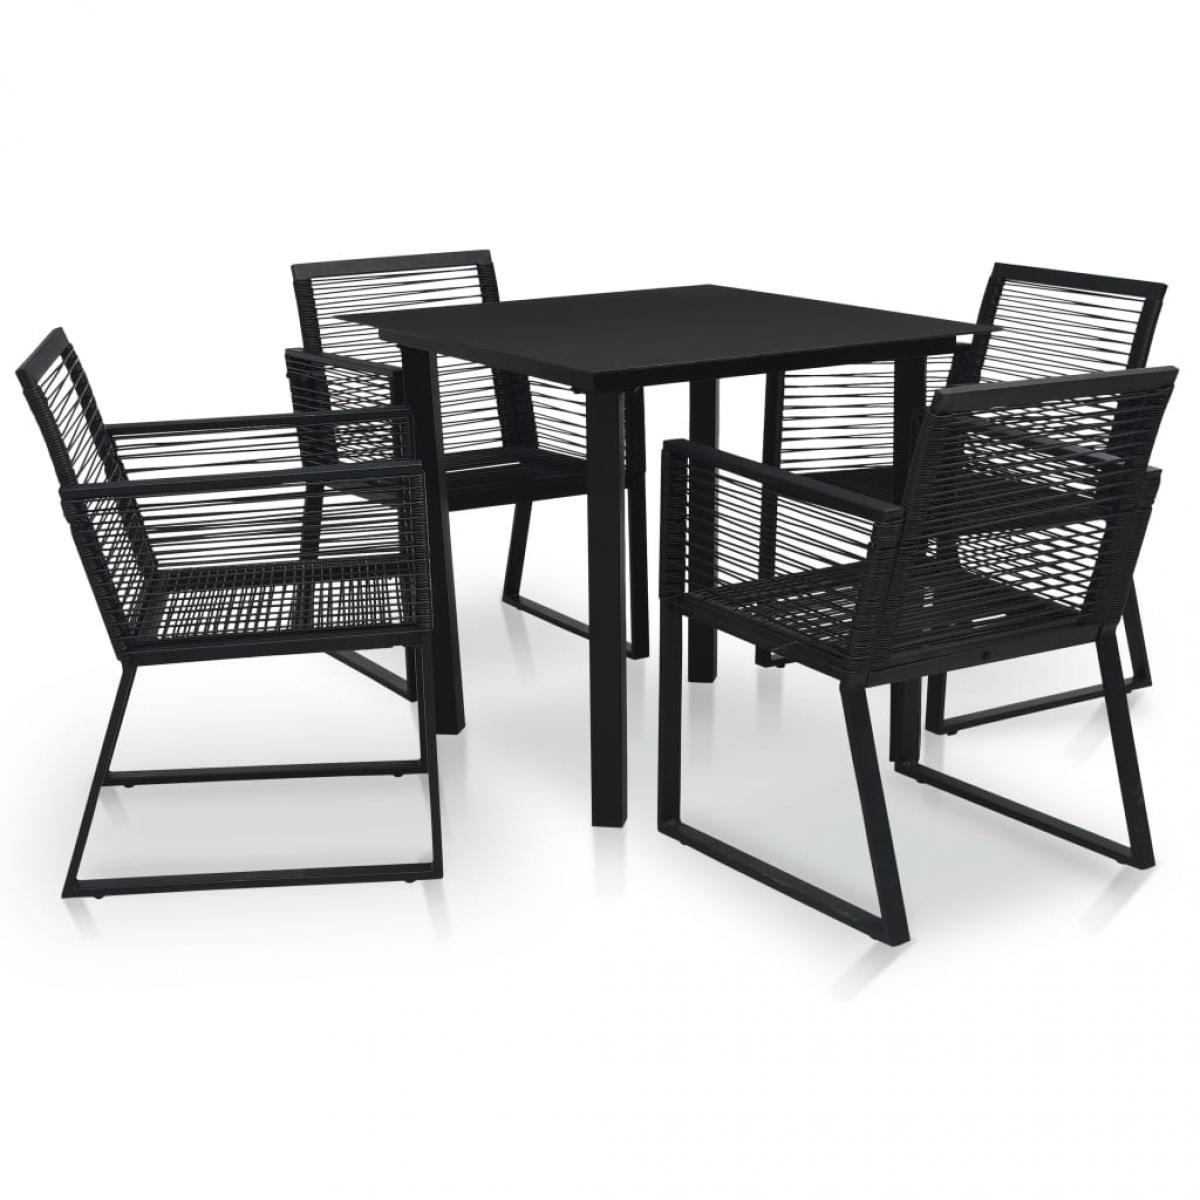 Vidaxl vidaXL Mobilier à dîner d'extérieur 5 pcs Rotin PVC Noir